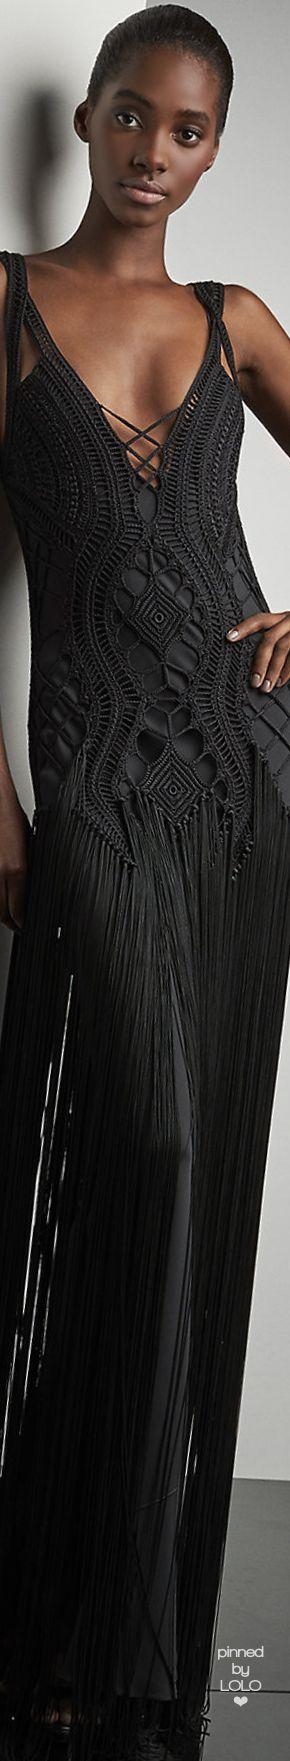 Ralph Lauren Crocheted Fringed Maxi Dress-Fall 2016 Runway Collection | LOLO❤︎